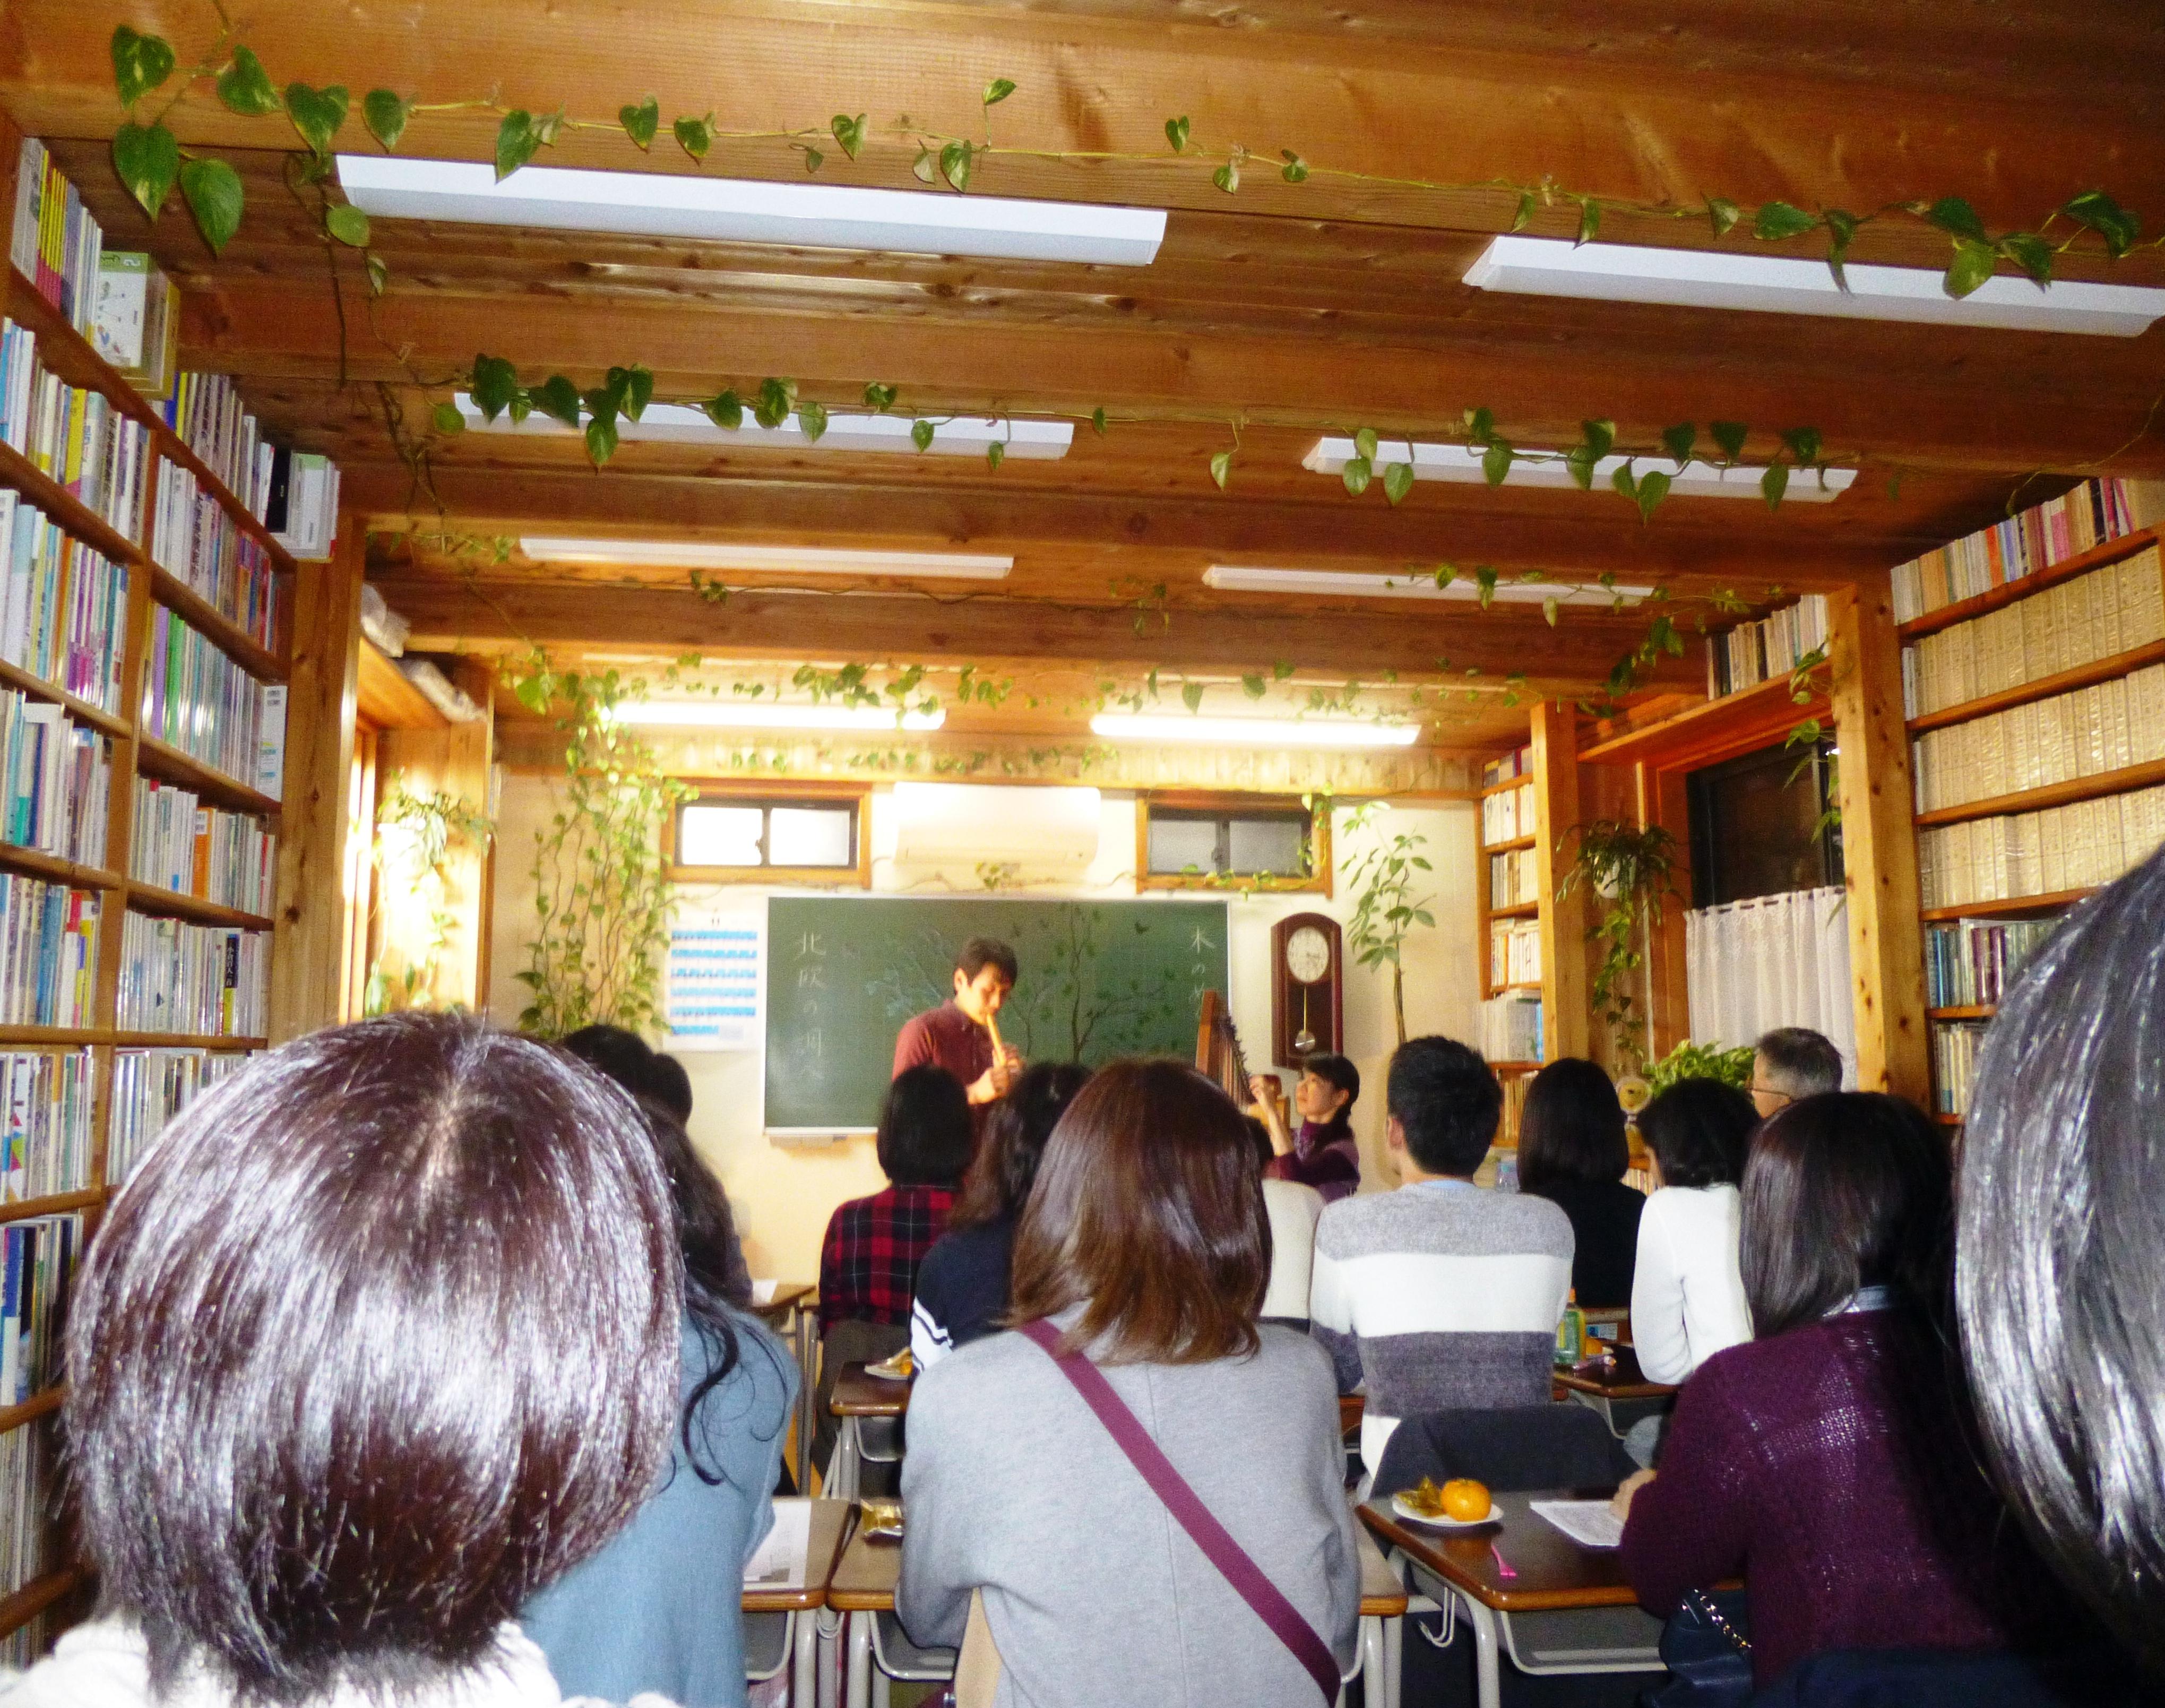 konsa-to-zenkei-2016-11-06